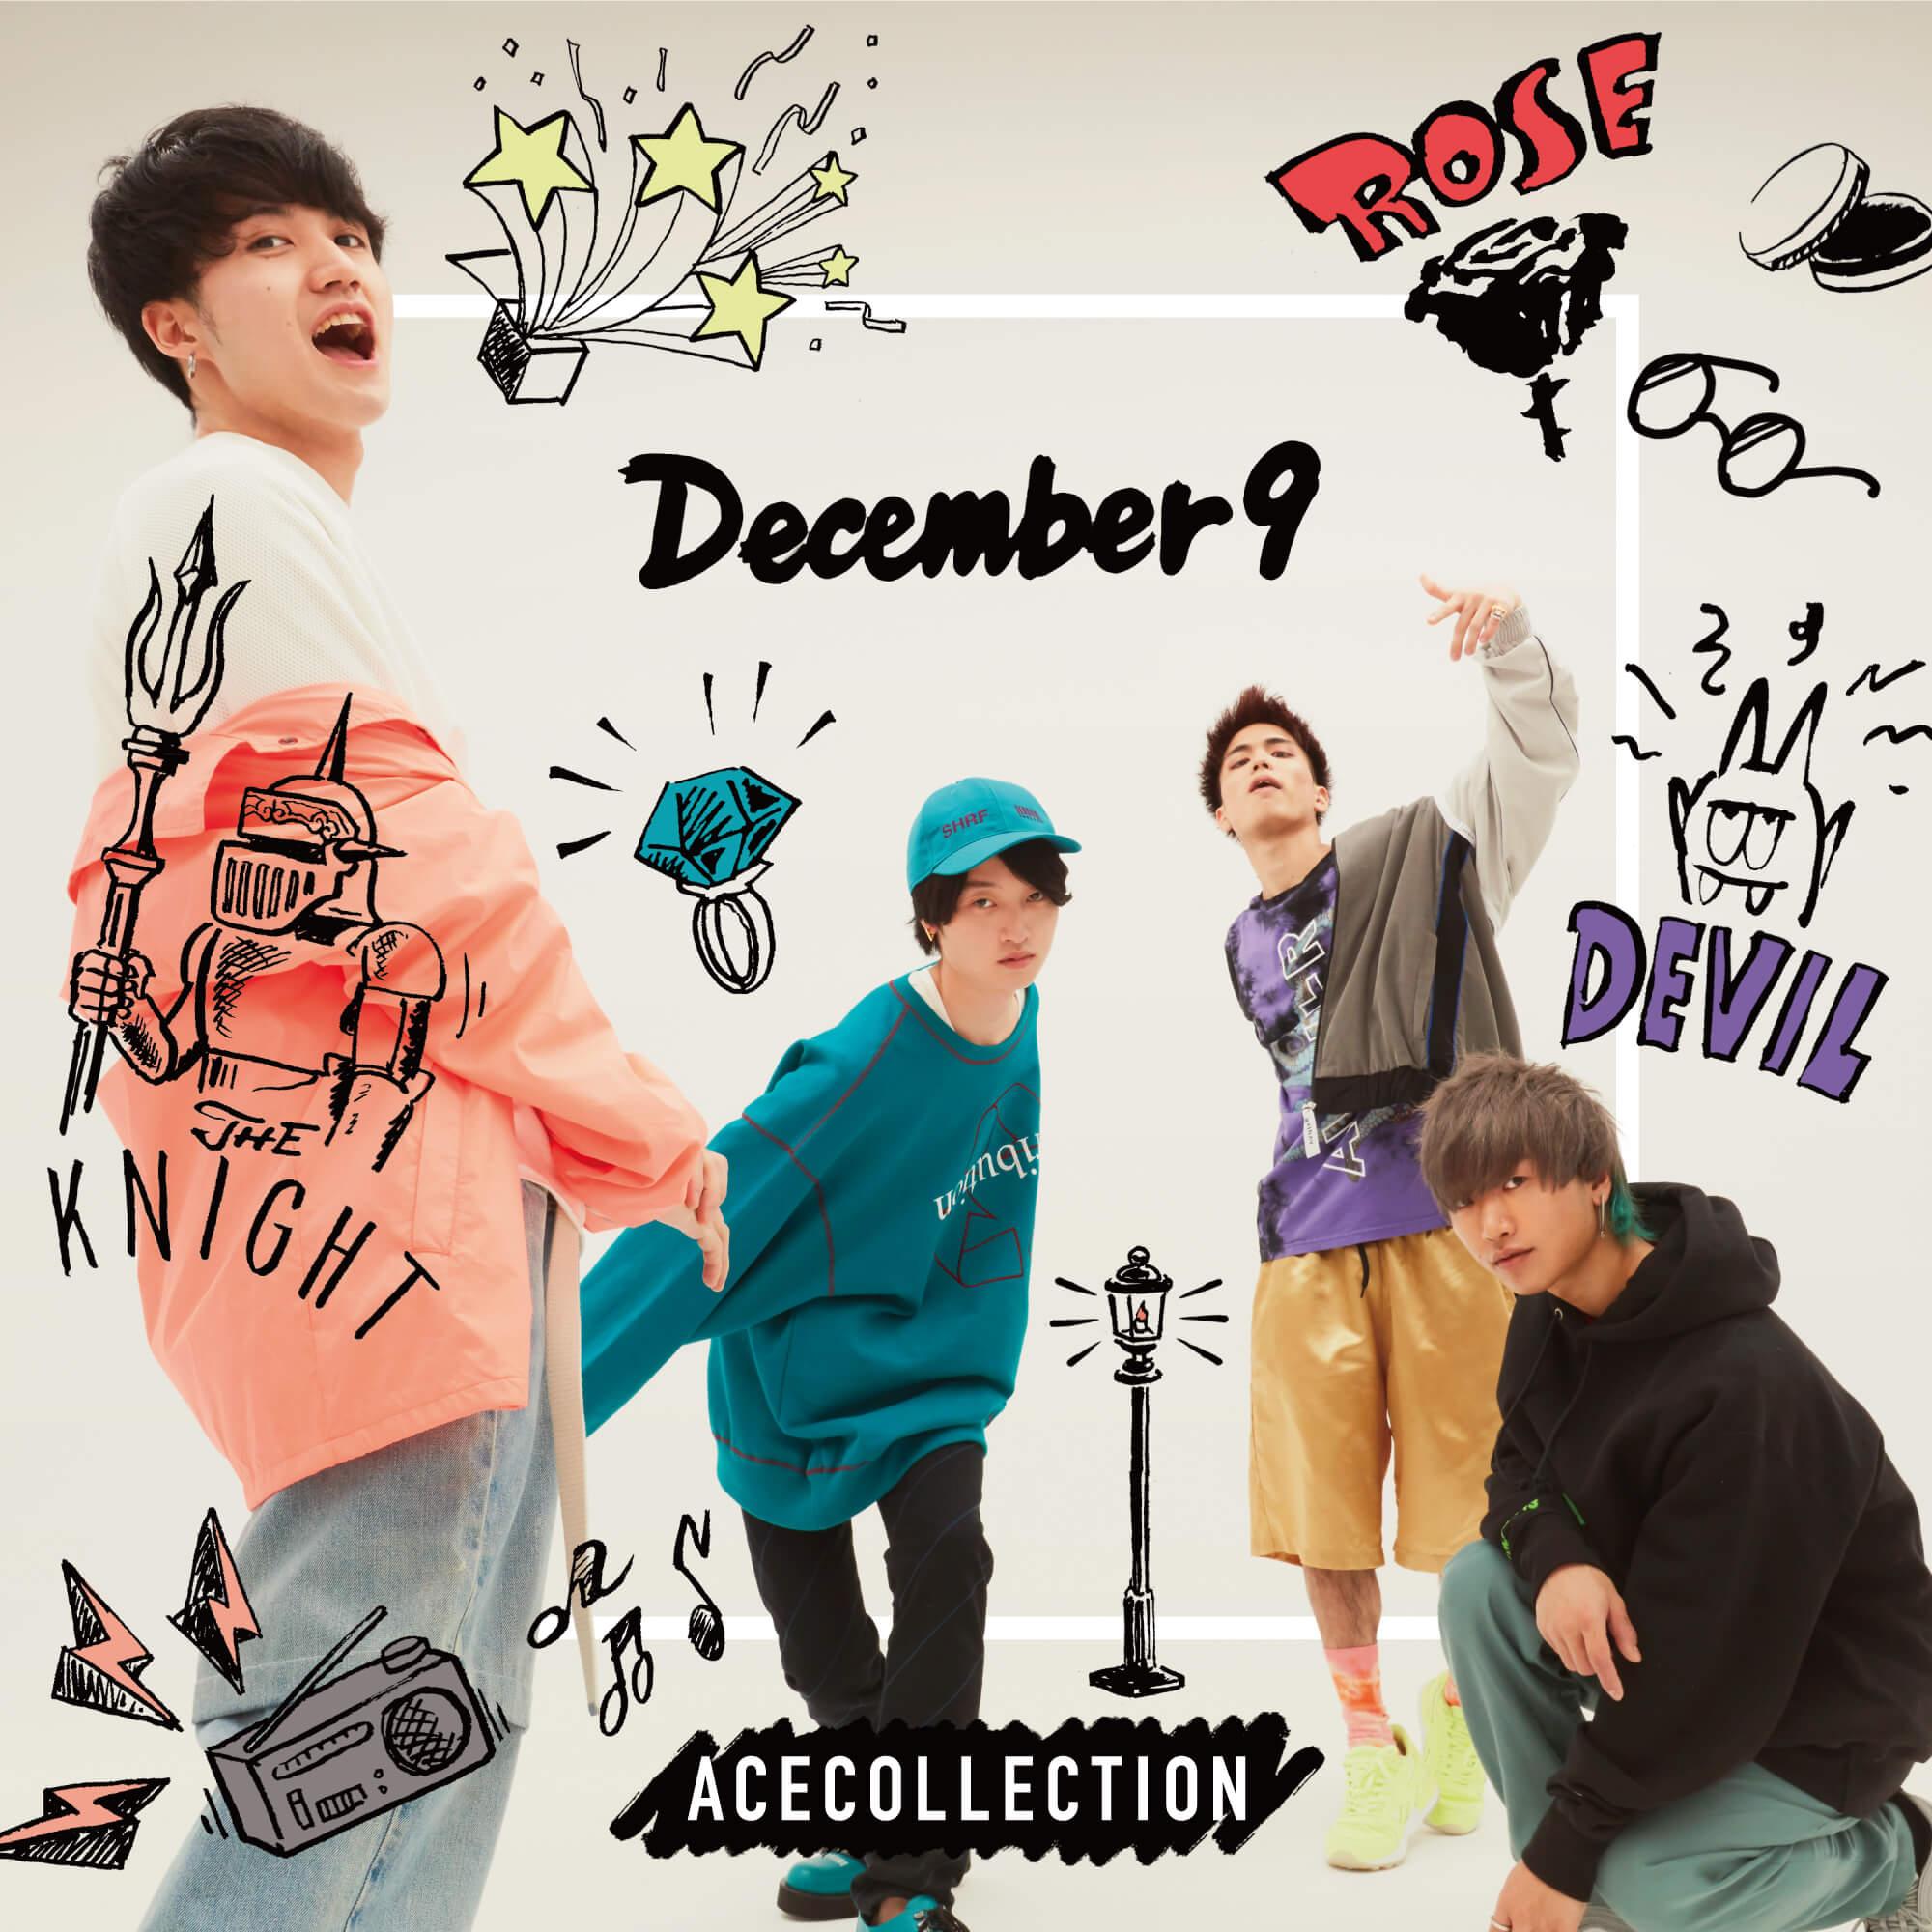 ACE COLLECTION、初アルバム「December 9」ジャケット&収録曲発表